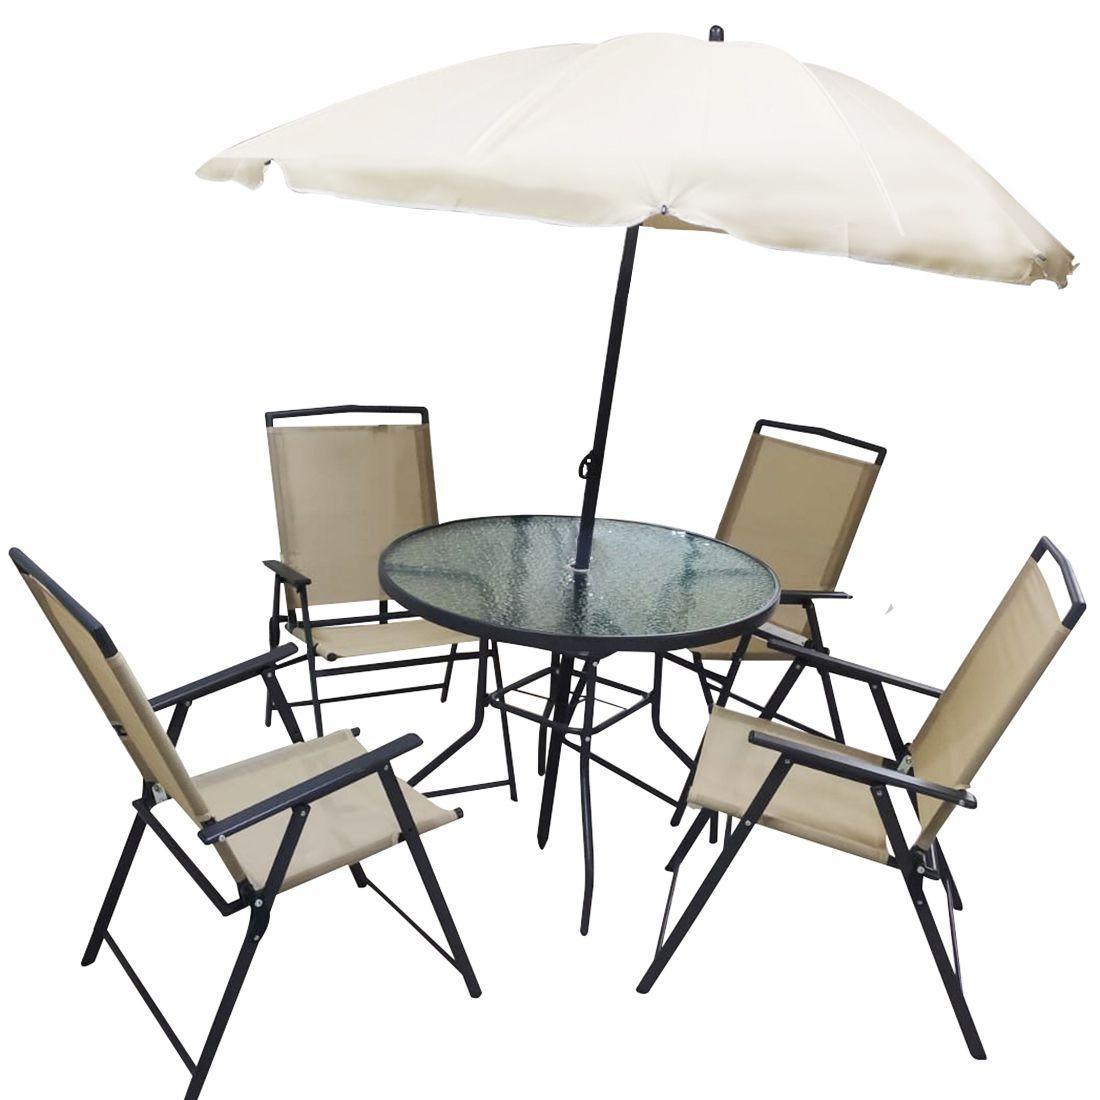 Conjunto Mesa Cadeira Guarda Sol Jardim Piscina Deck Varanda Ombrelone Lazer